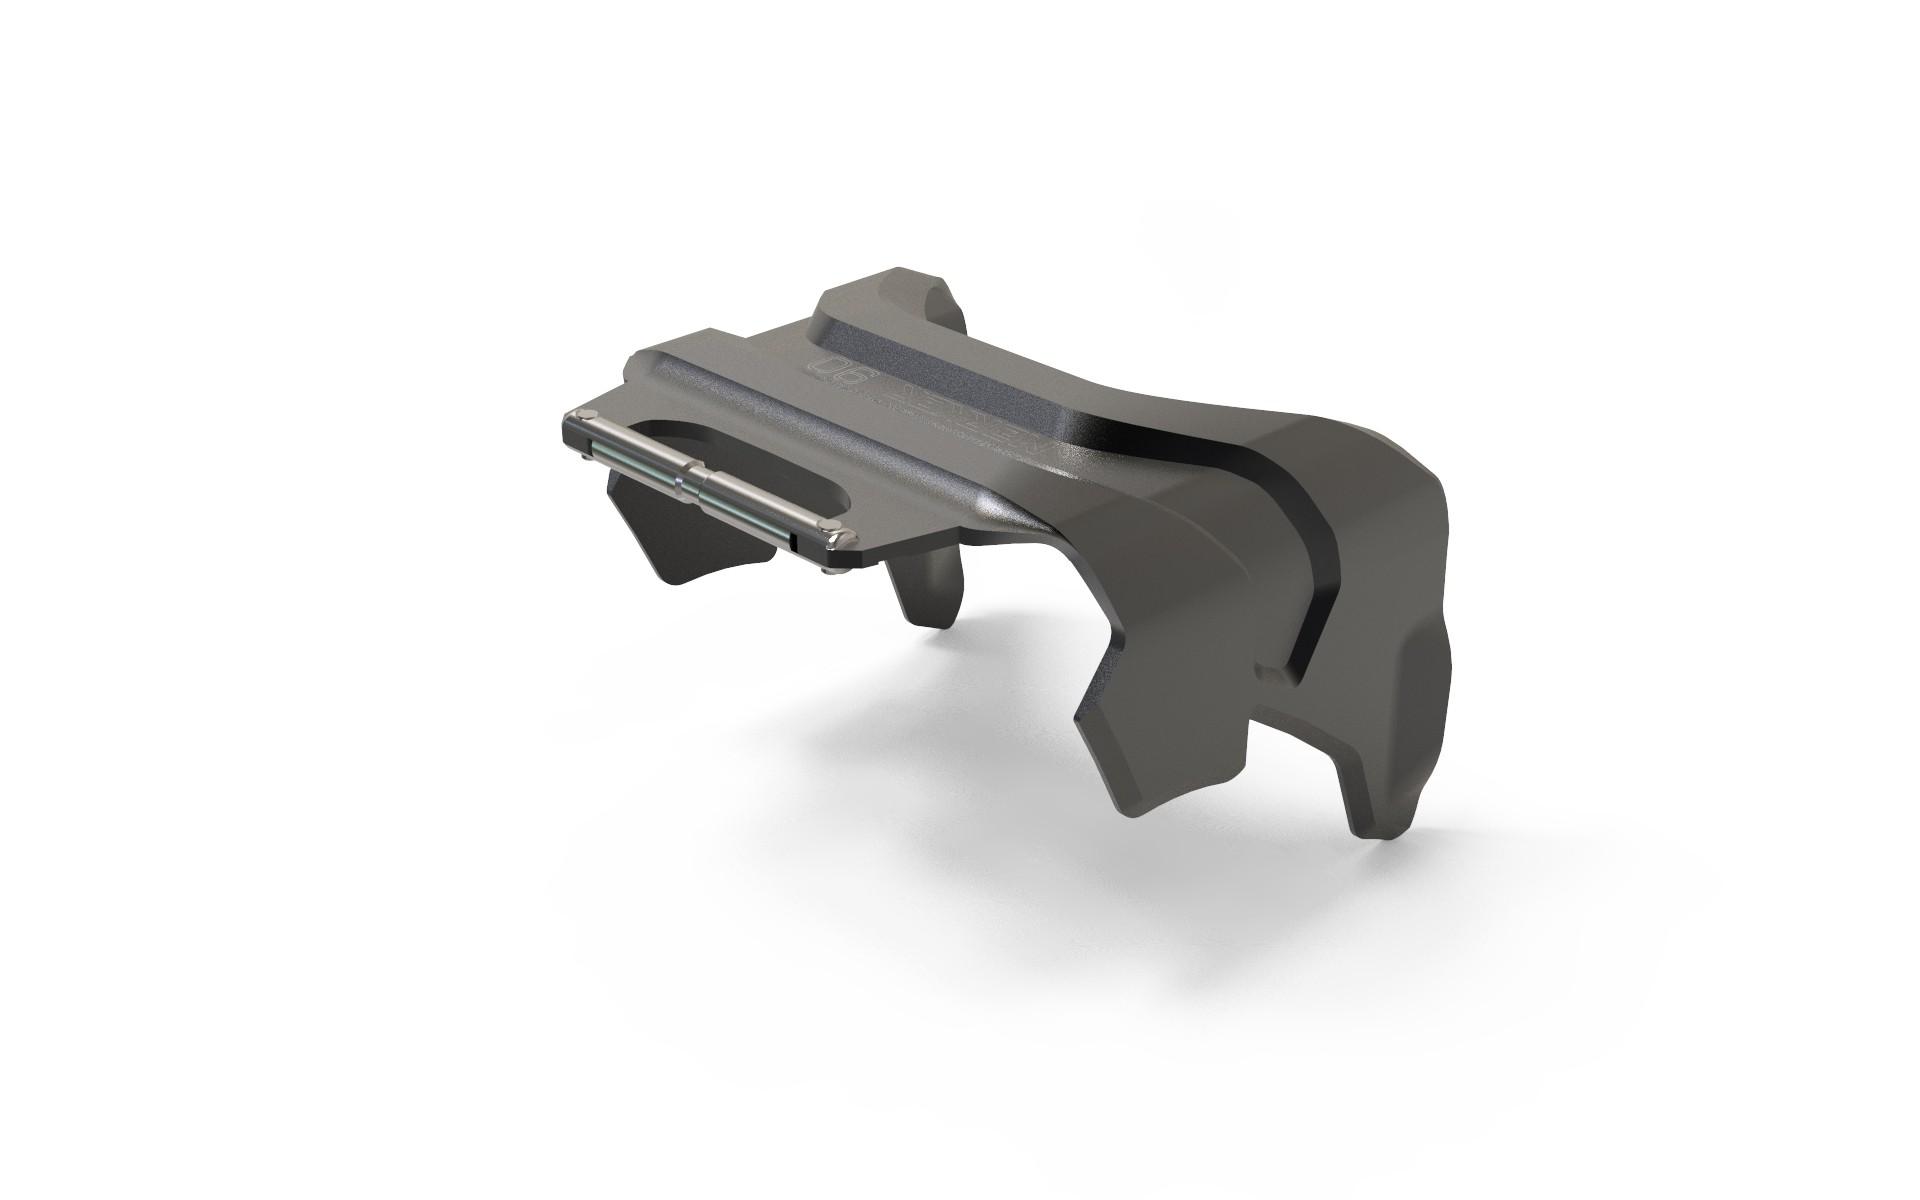 Crampon Pintech 90mm (ski width 75-90mm)